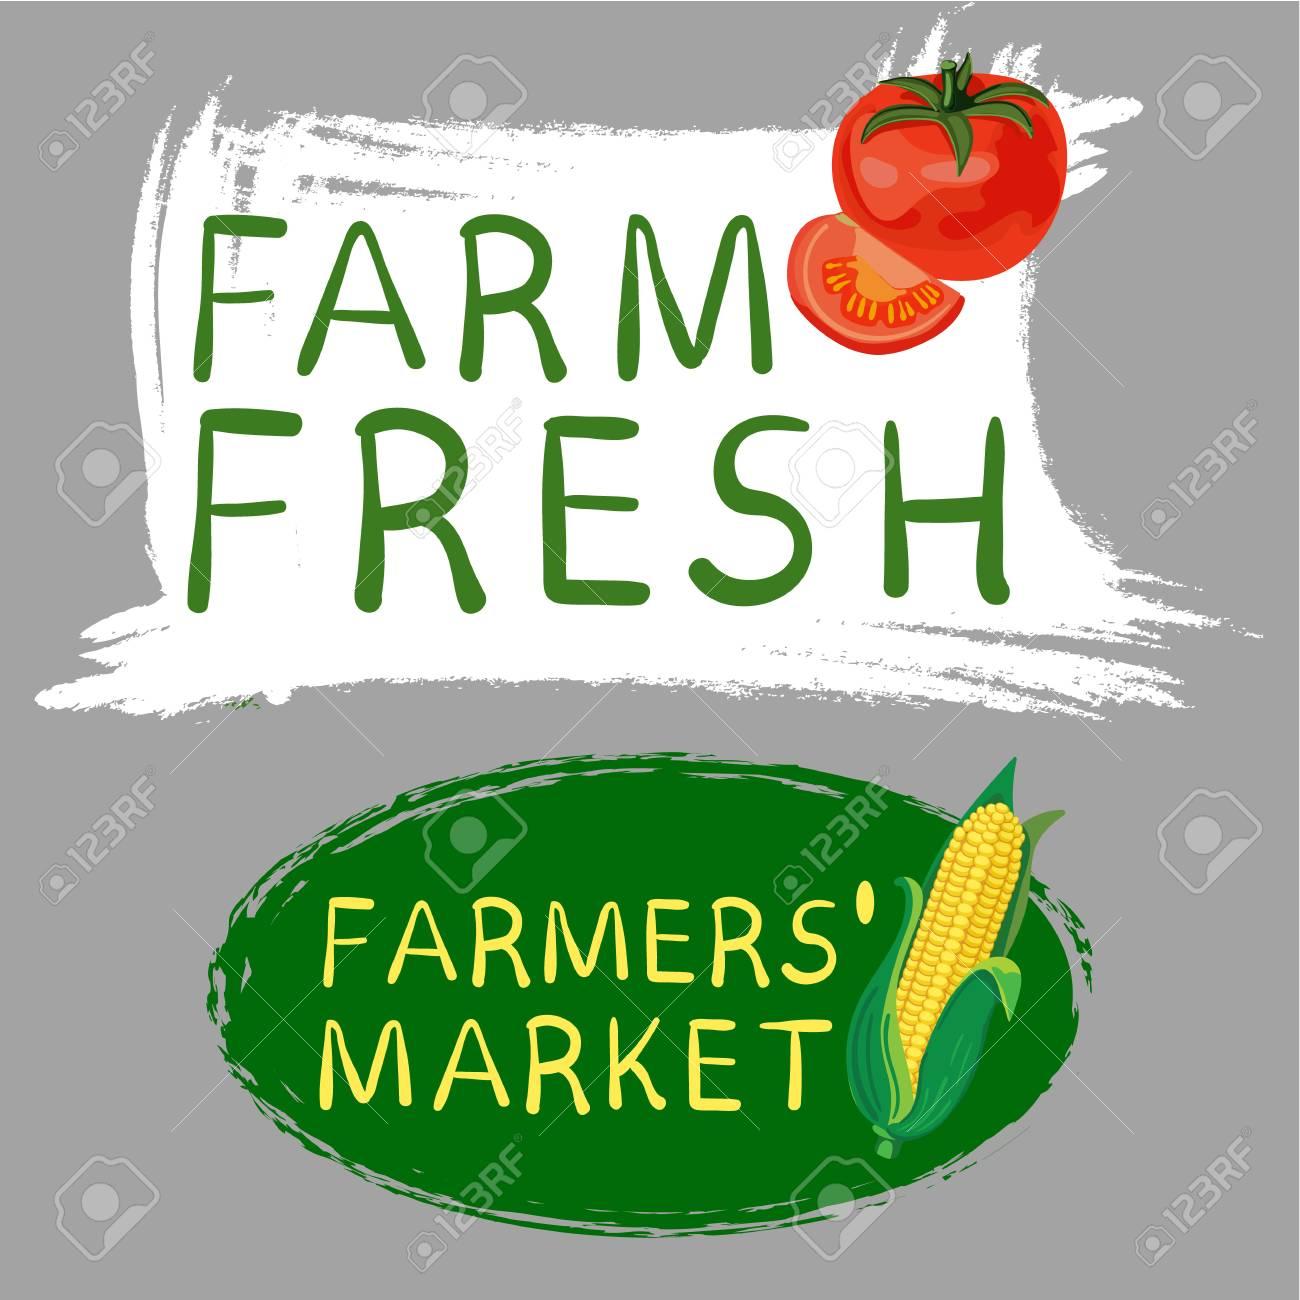 A Farmers market fresh food and vegan food logo  Hand drawn illustrations